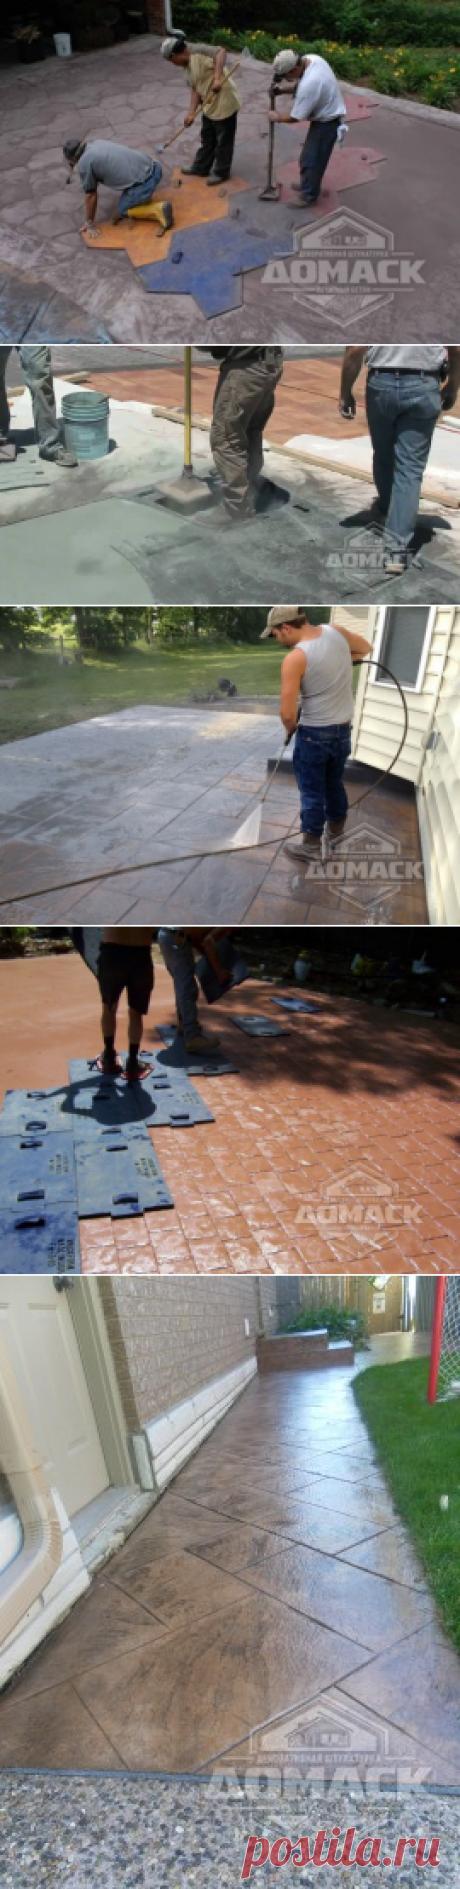 Технология укладки печатного бетона